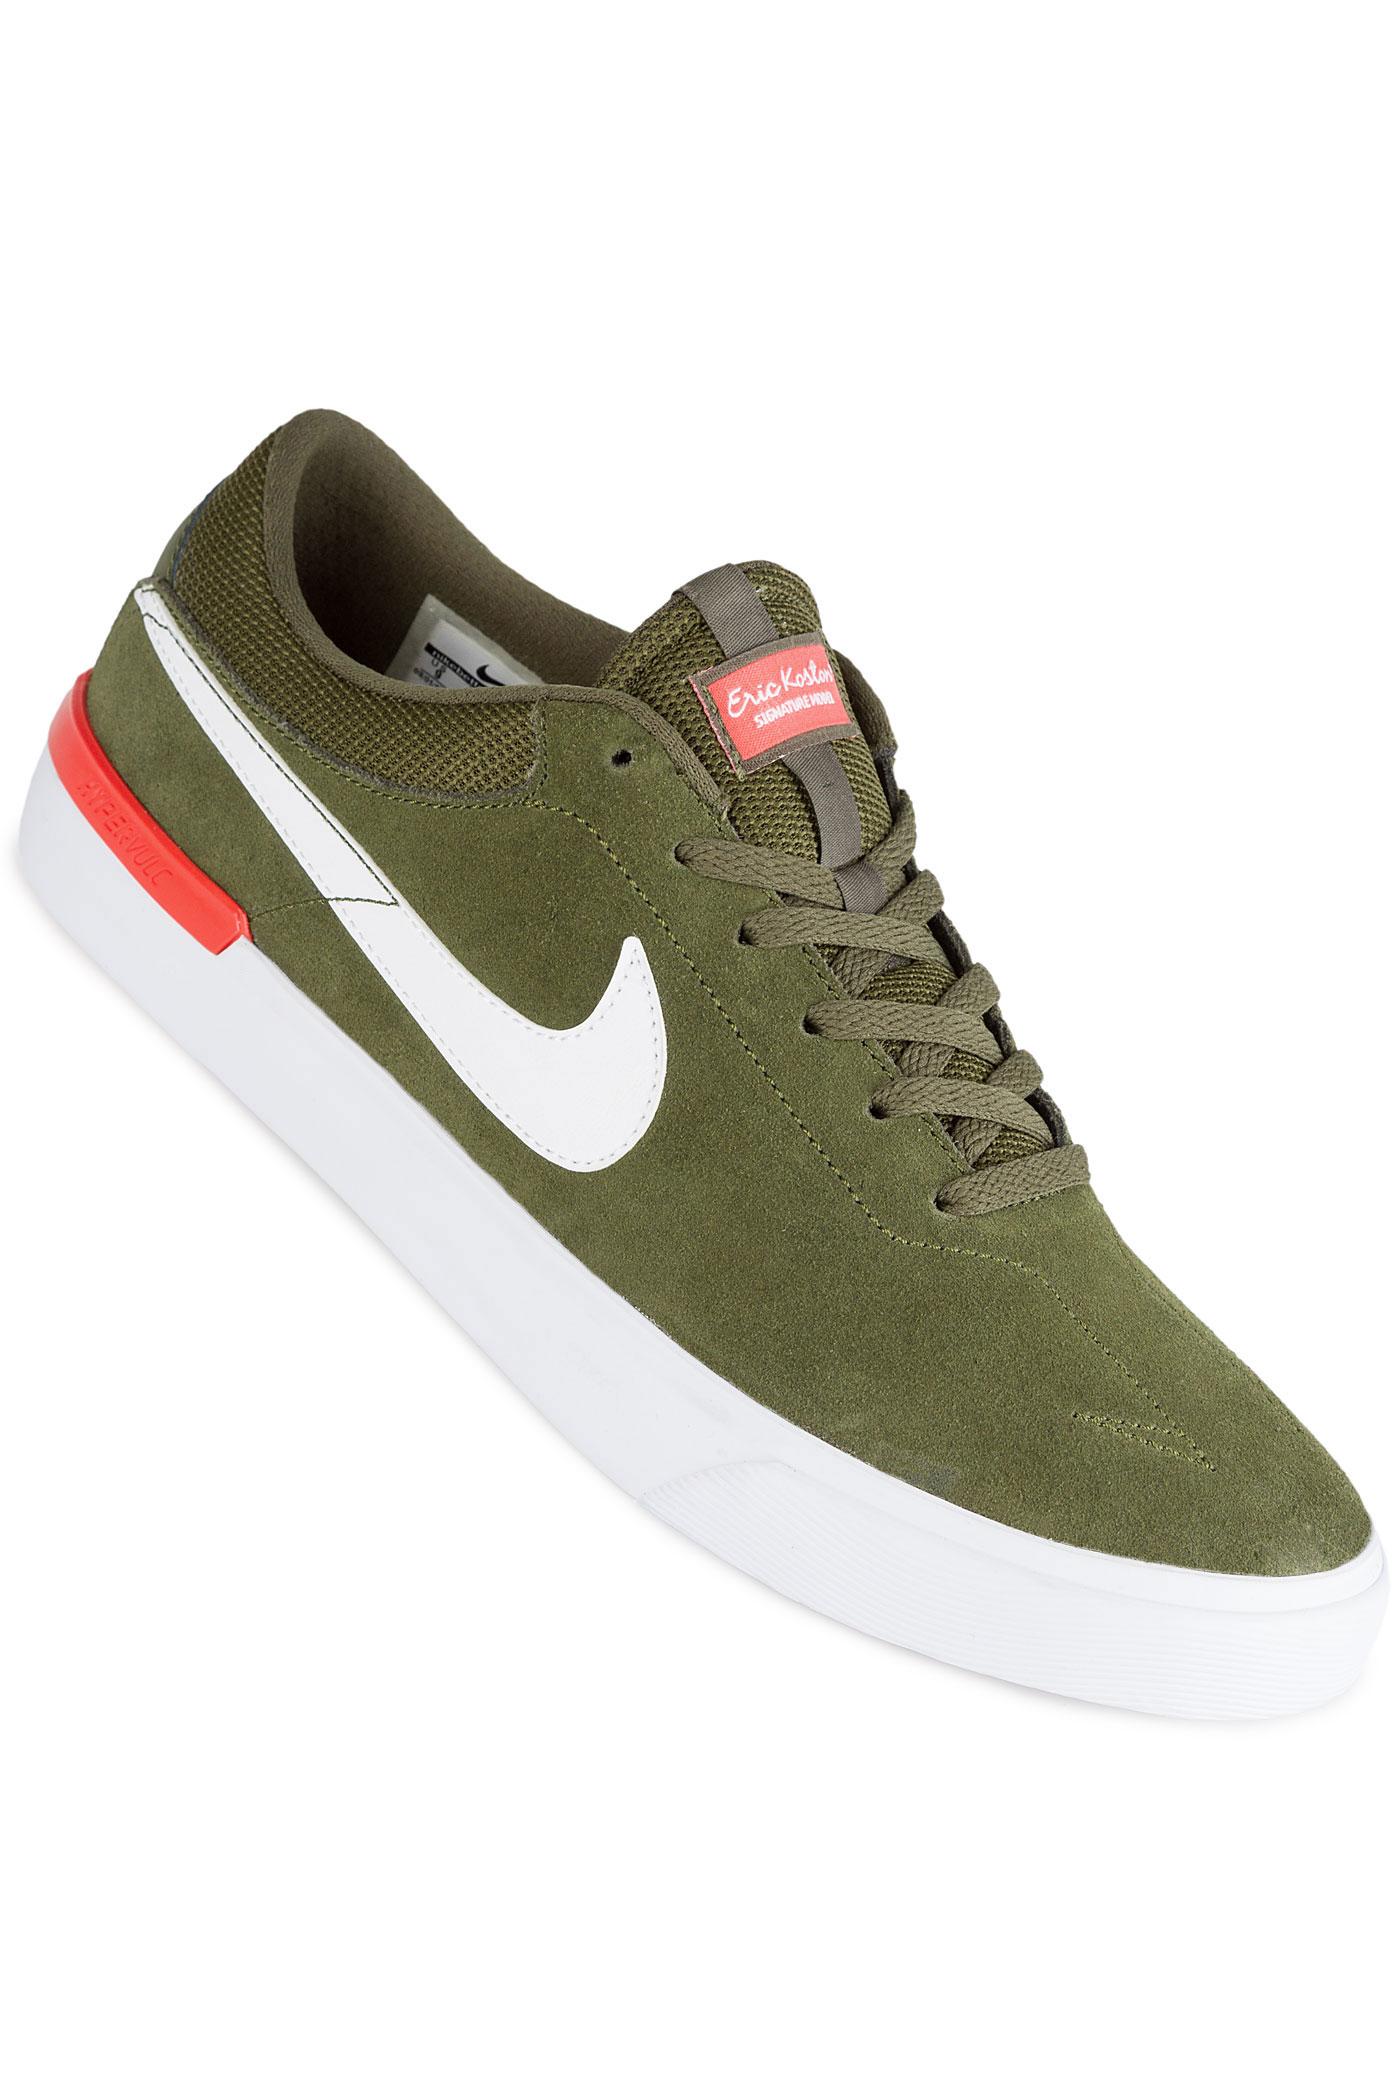 nike sb koston hypervulc chaussure legion green white max orange achetez sur skatedeluxe. Black Bedroom Furniture Sets. Home Design Ideas